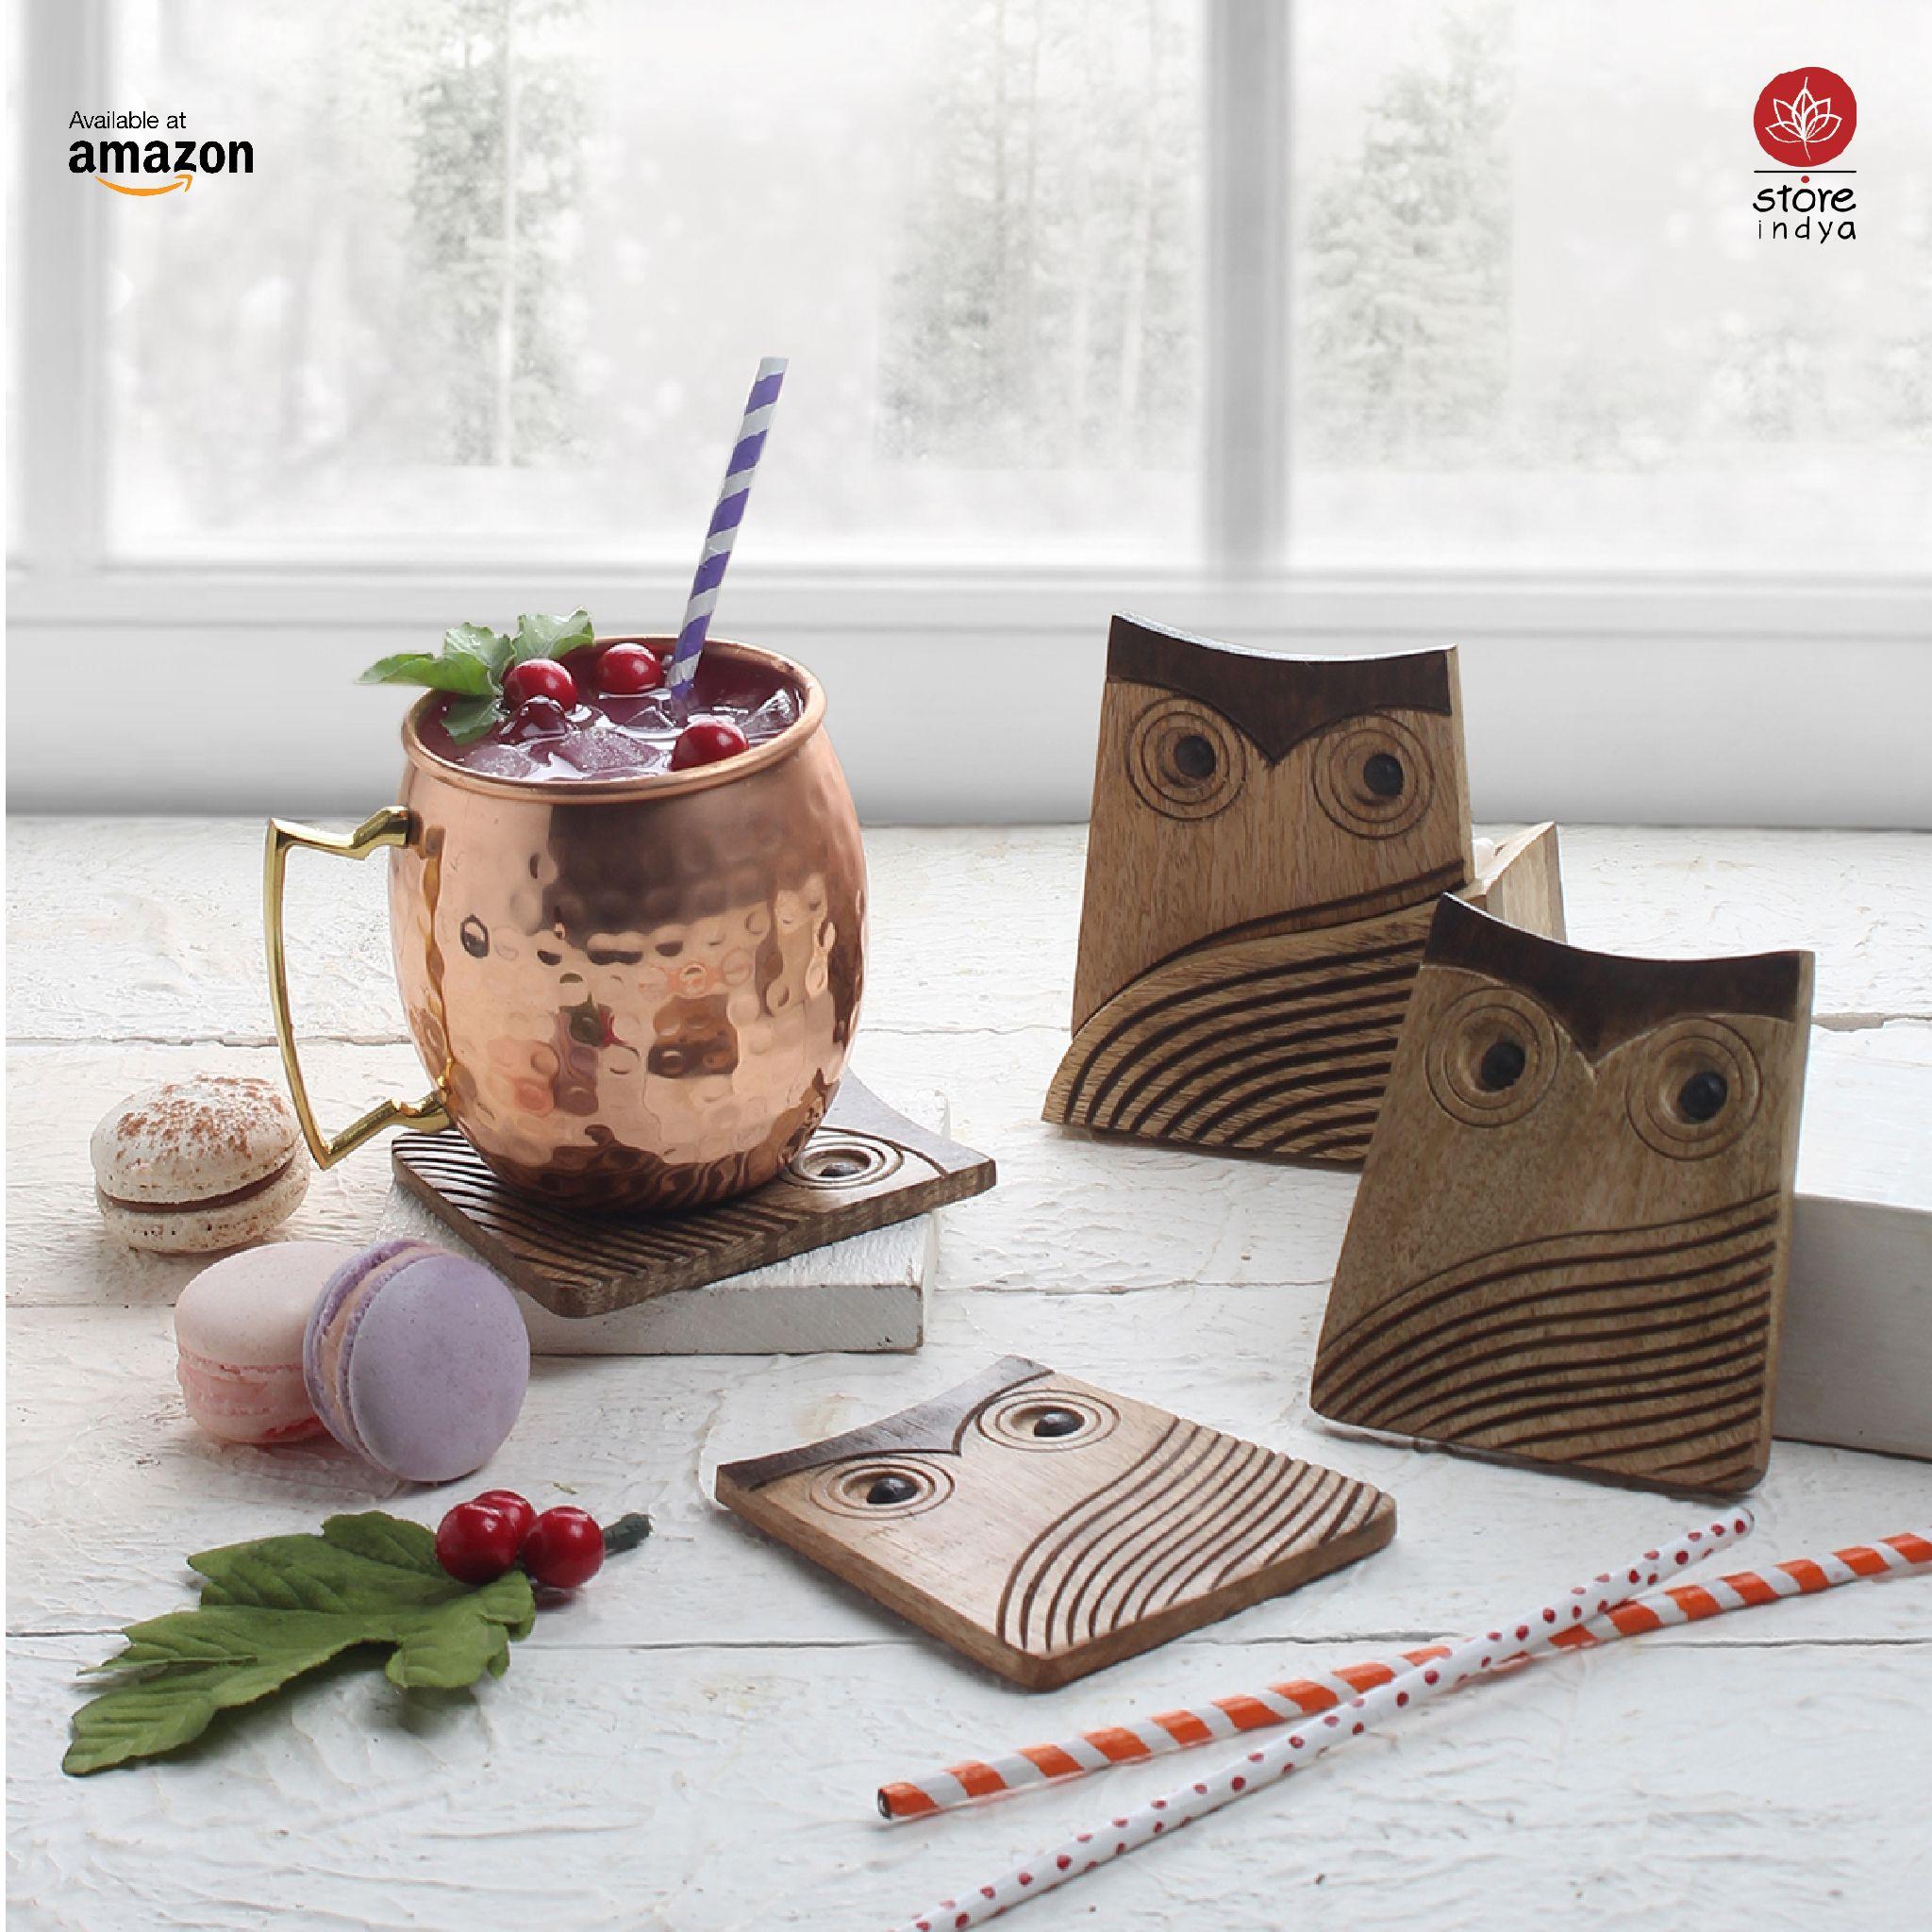 Amazon.co.uk Store Indya Coasters With Holder Wooden